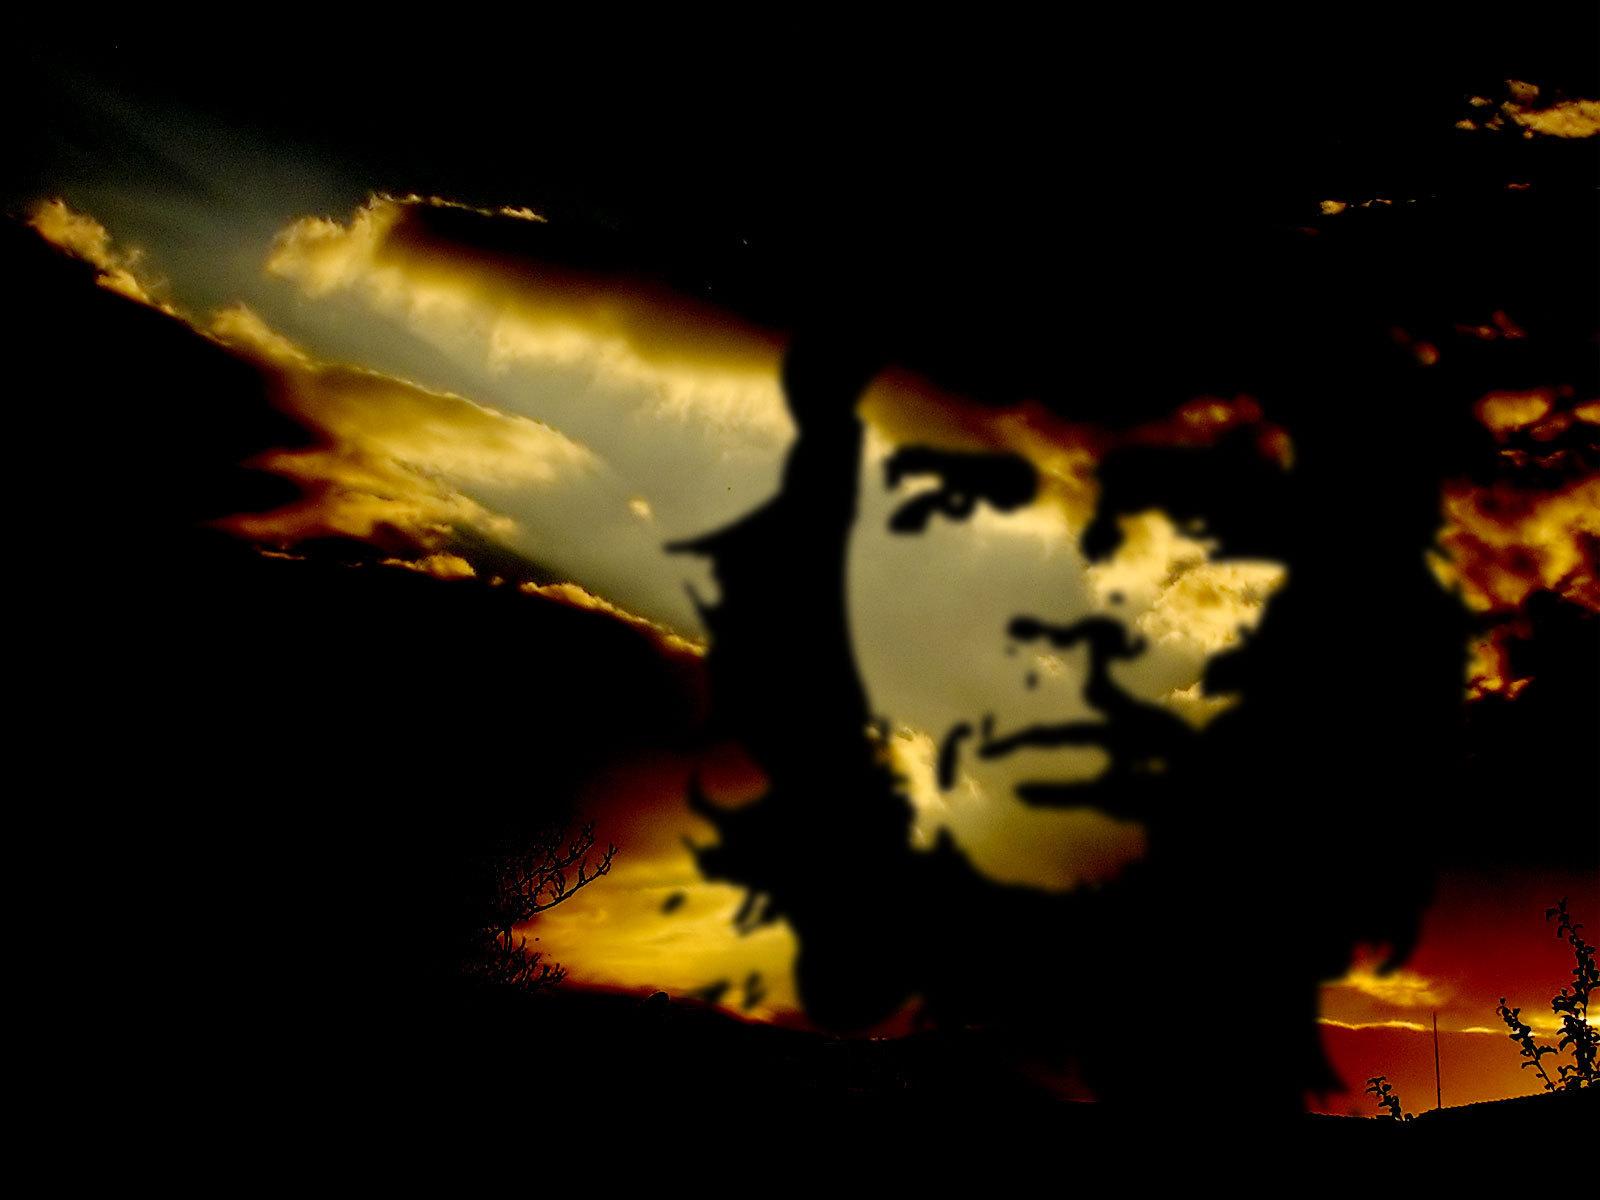 Che Guevara images Che wallpaper photos 2825966 1600x1200